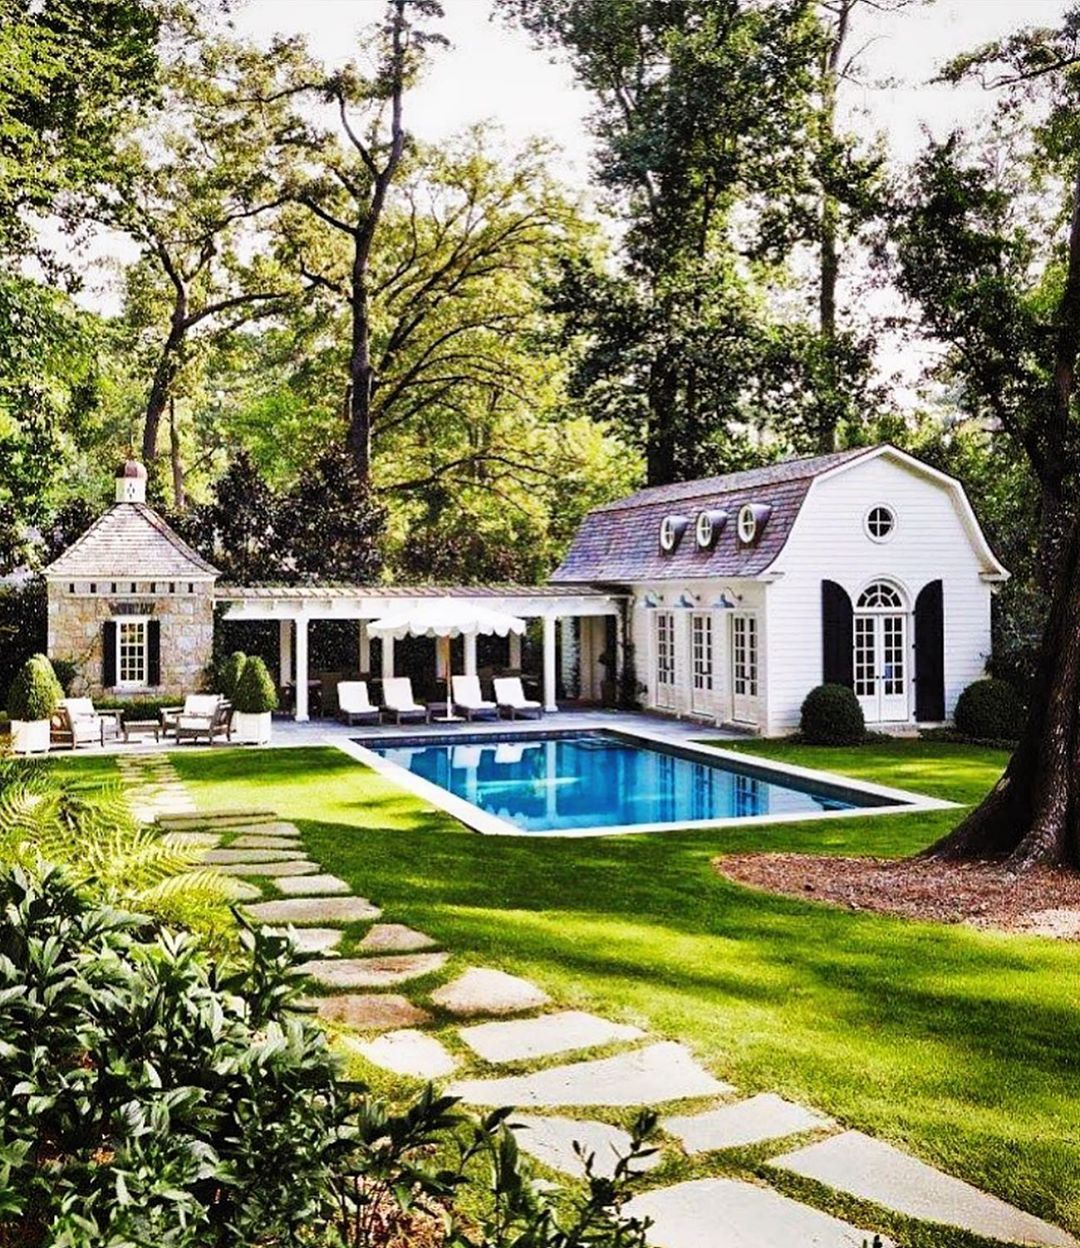 Secrets Of A Hostess On Instagram Delightful Pool House Designed By Dsdixonarchitect In 2020 Dream House Exterior Pool House Designs House Designs Exterior